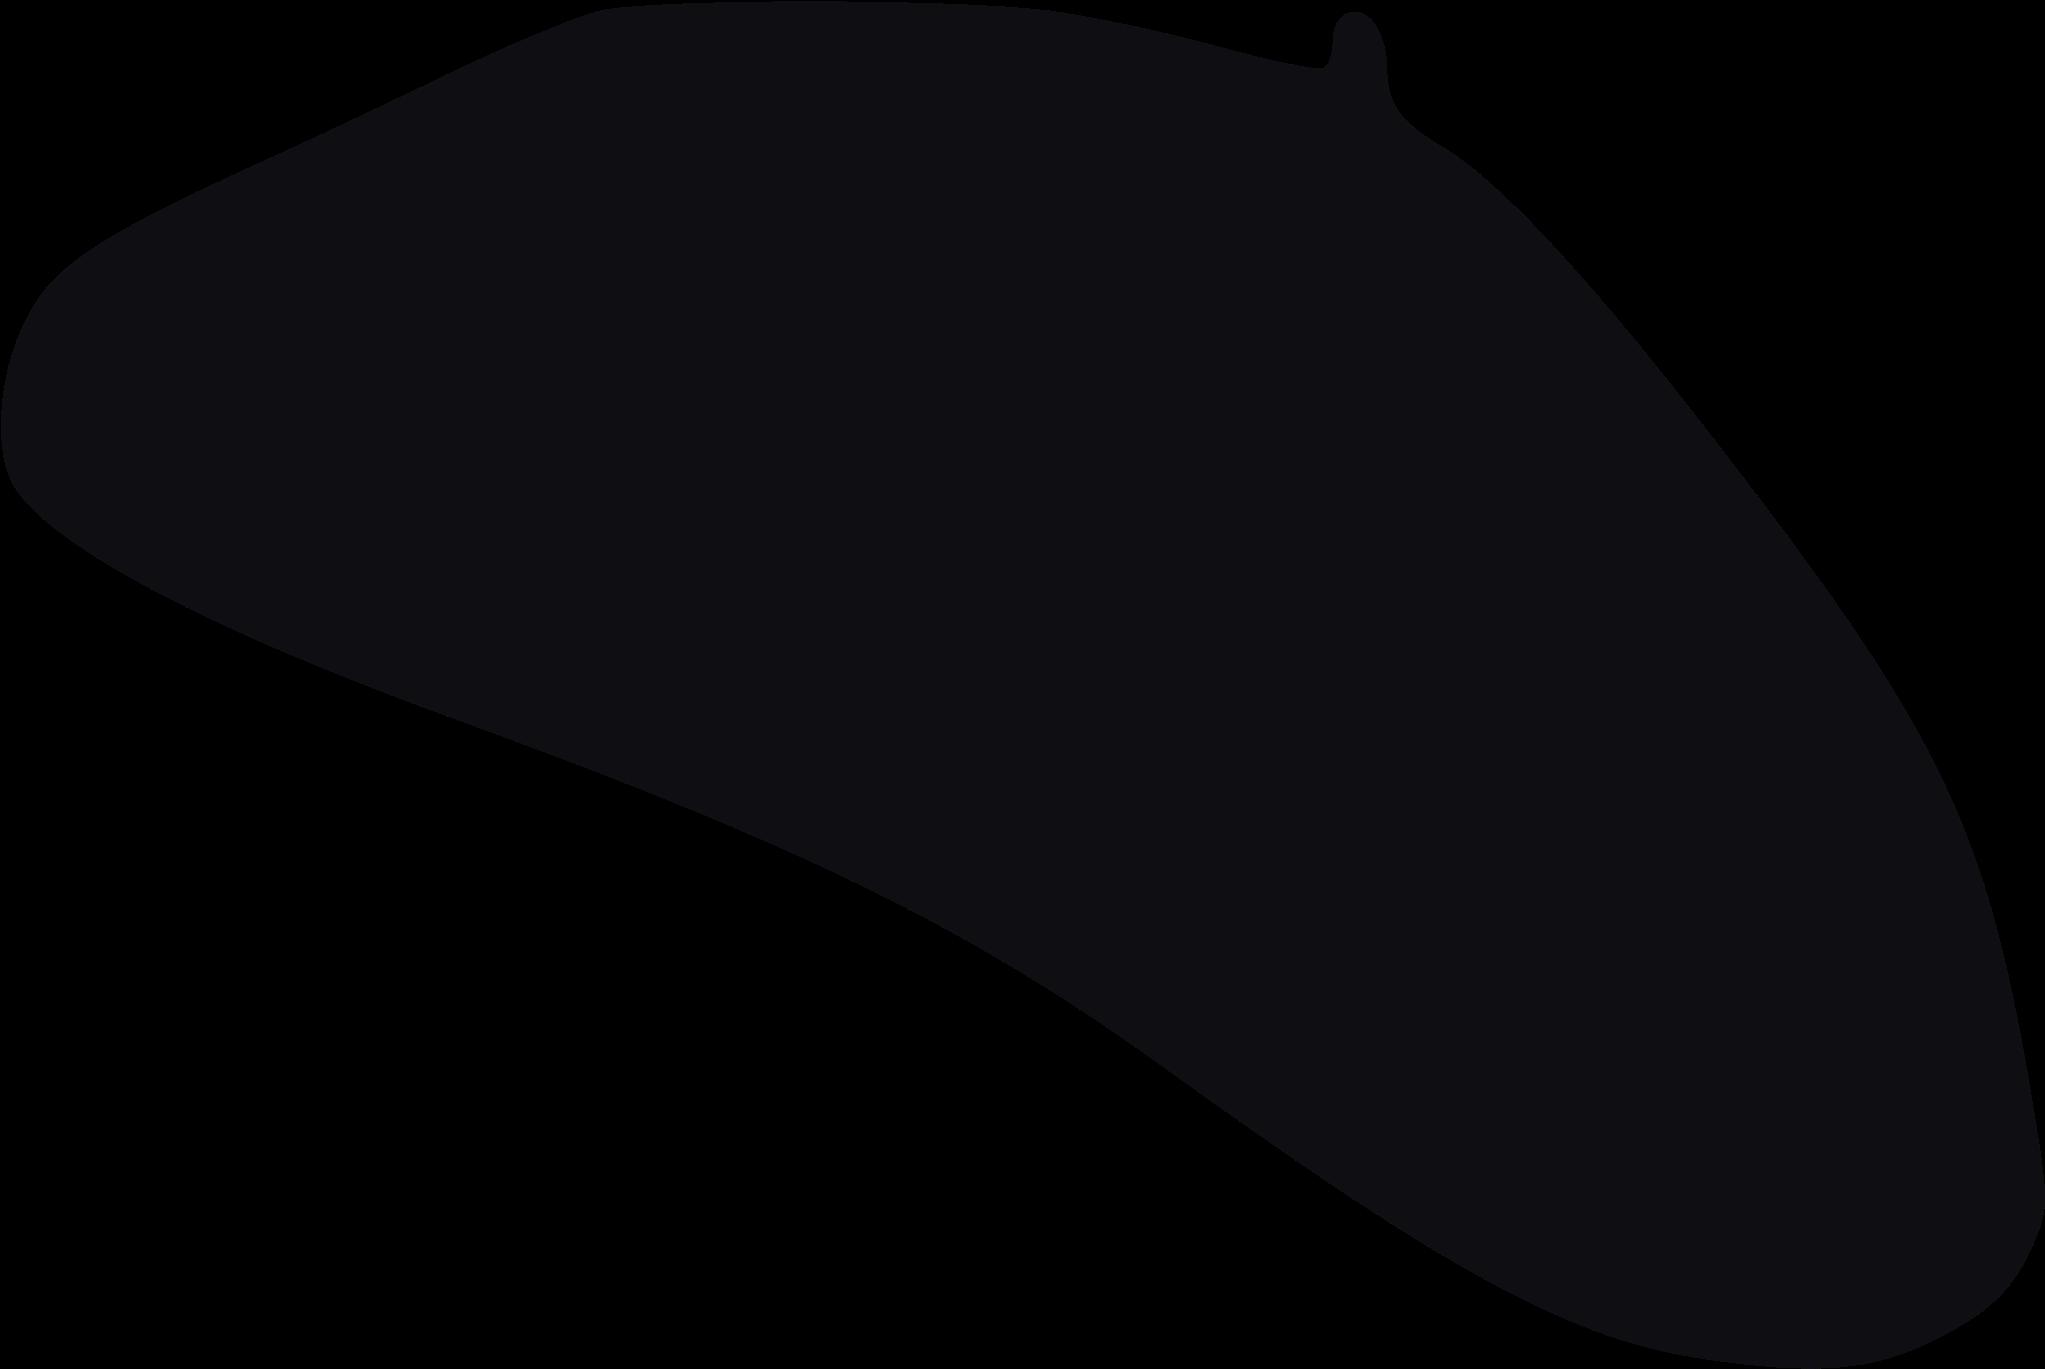 b89d2dd861ed8 Download Clipart - Beret Png - Full Size PNG Image - PNGkit